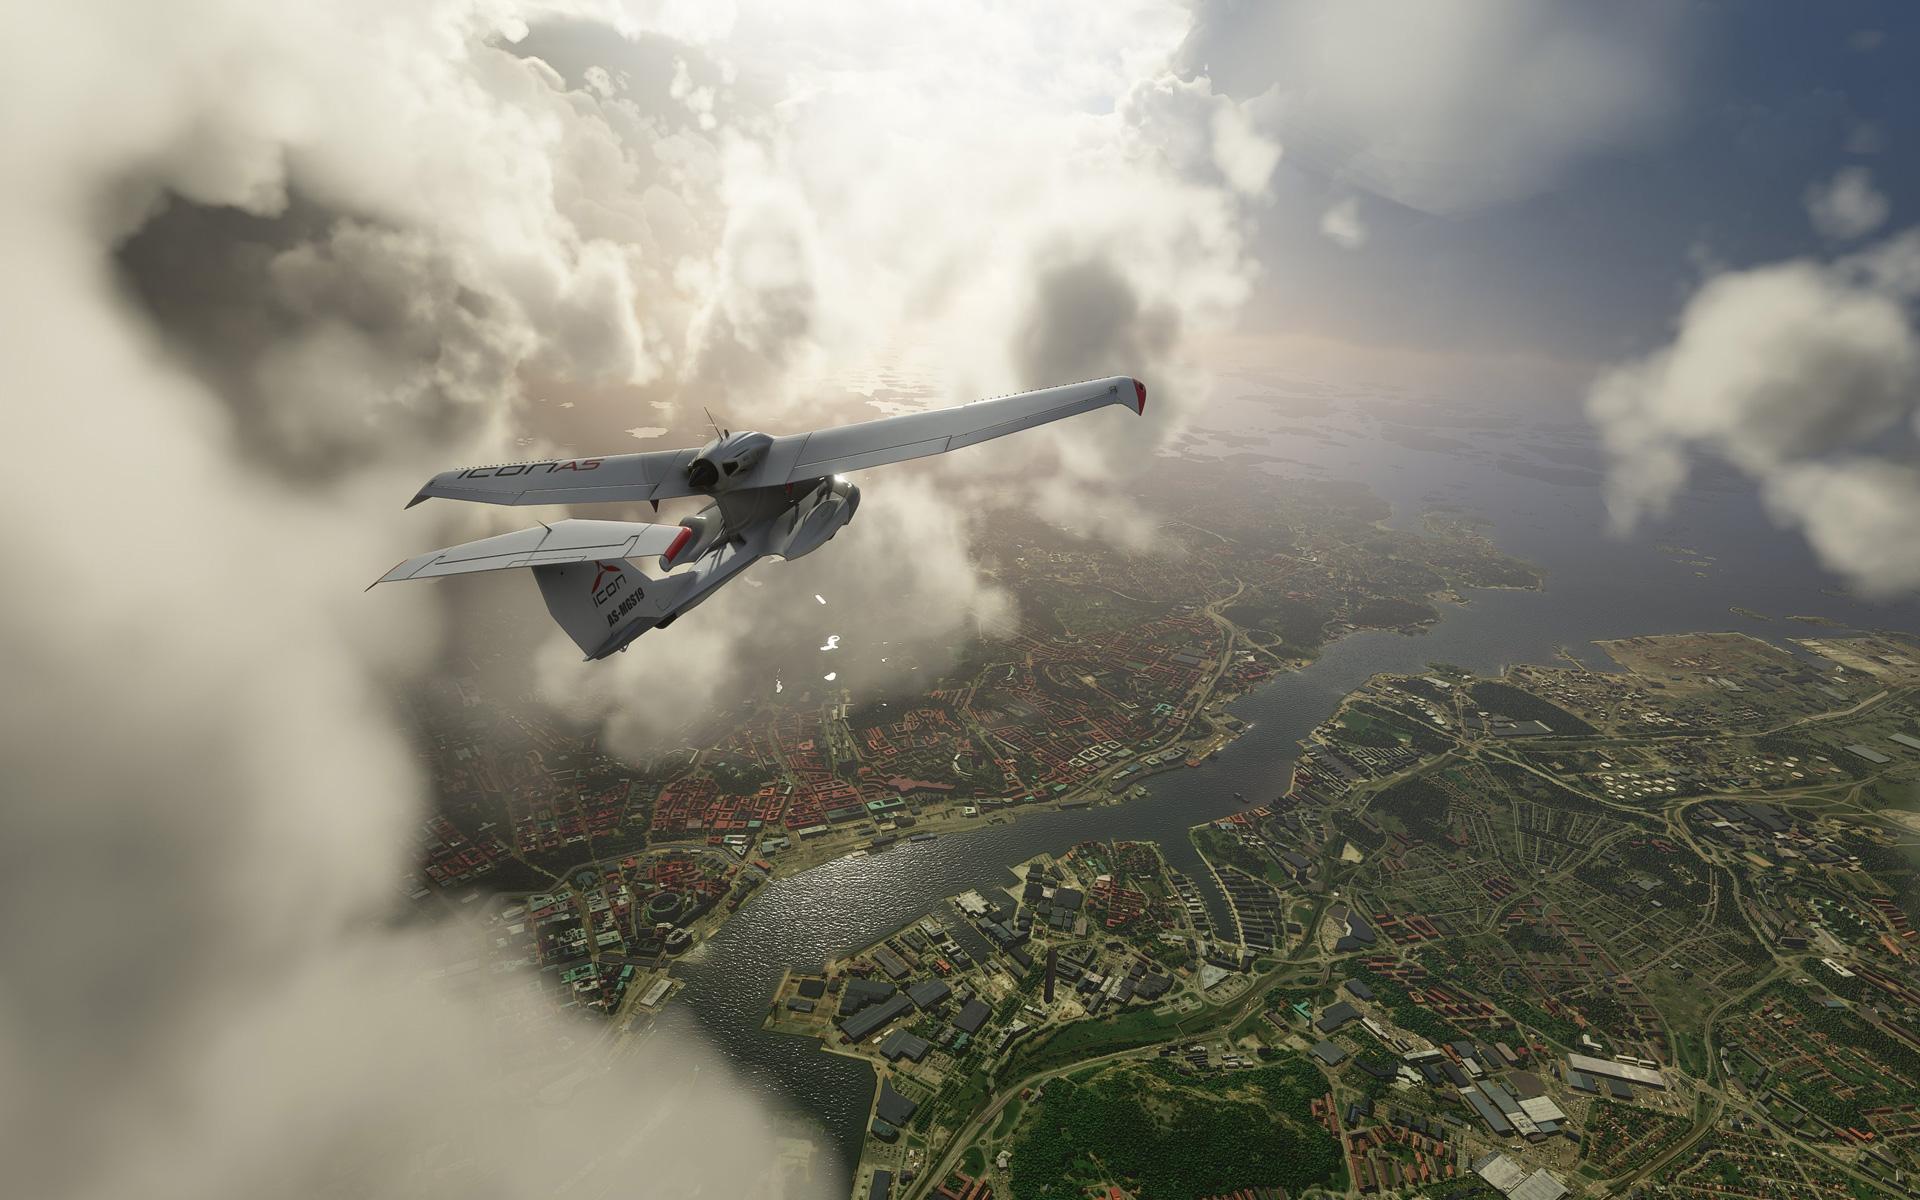 Free Microsoft Flight Simulator (2020) Wallpaper in 1920x1200